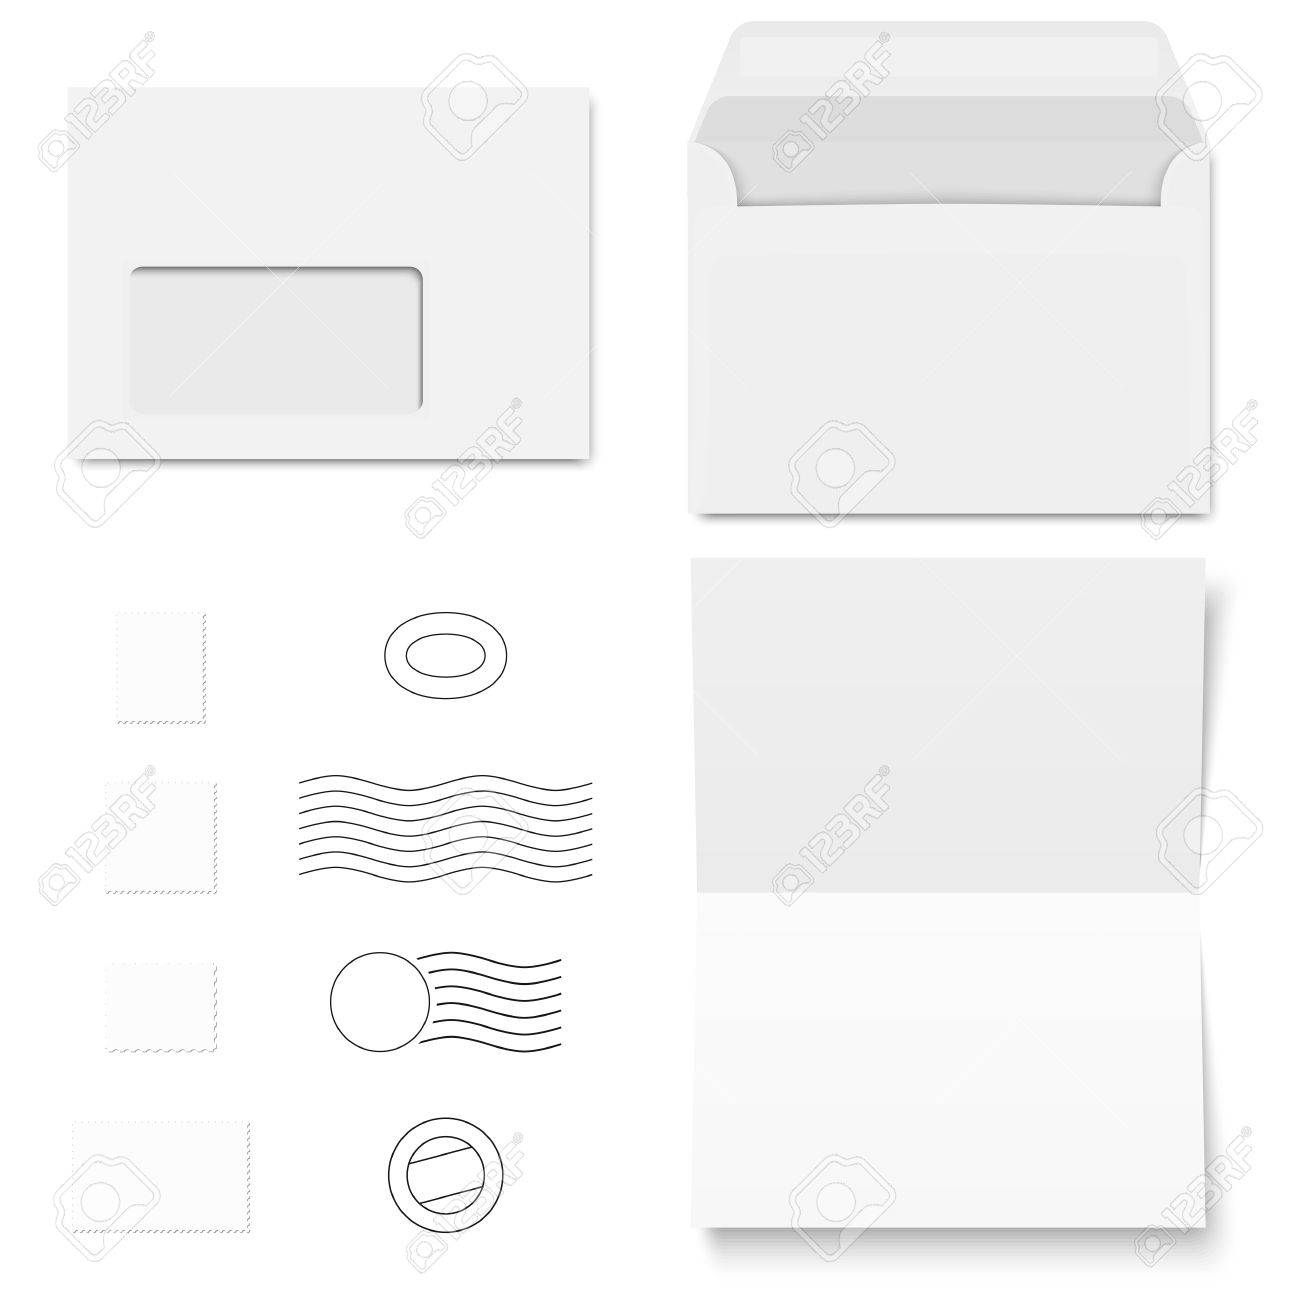 Standard Envelopes Roho 4senses Co